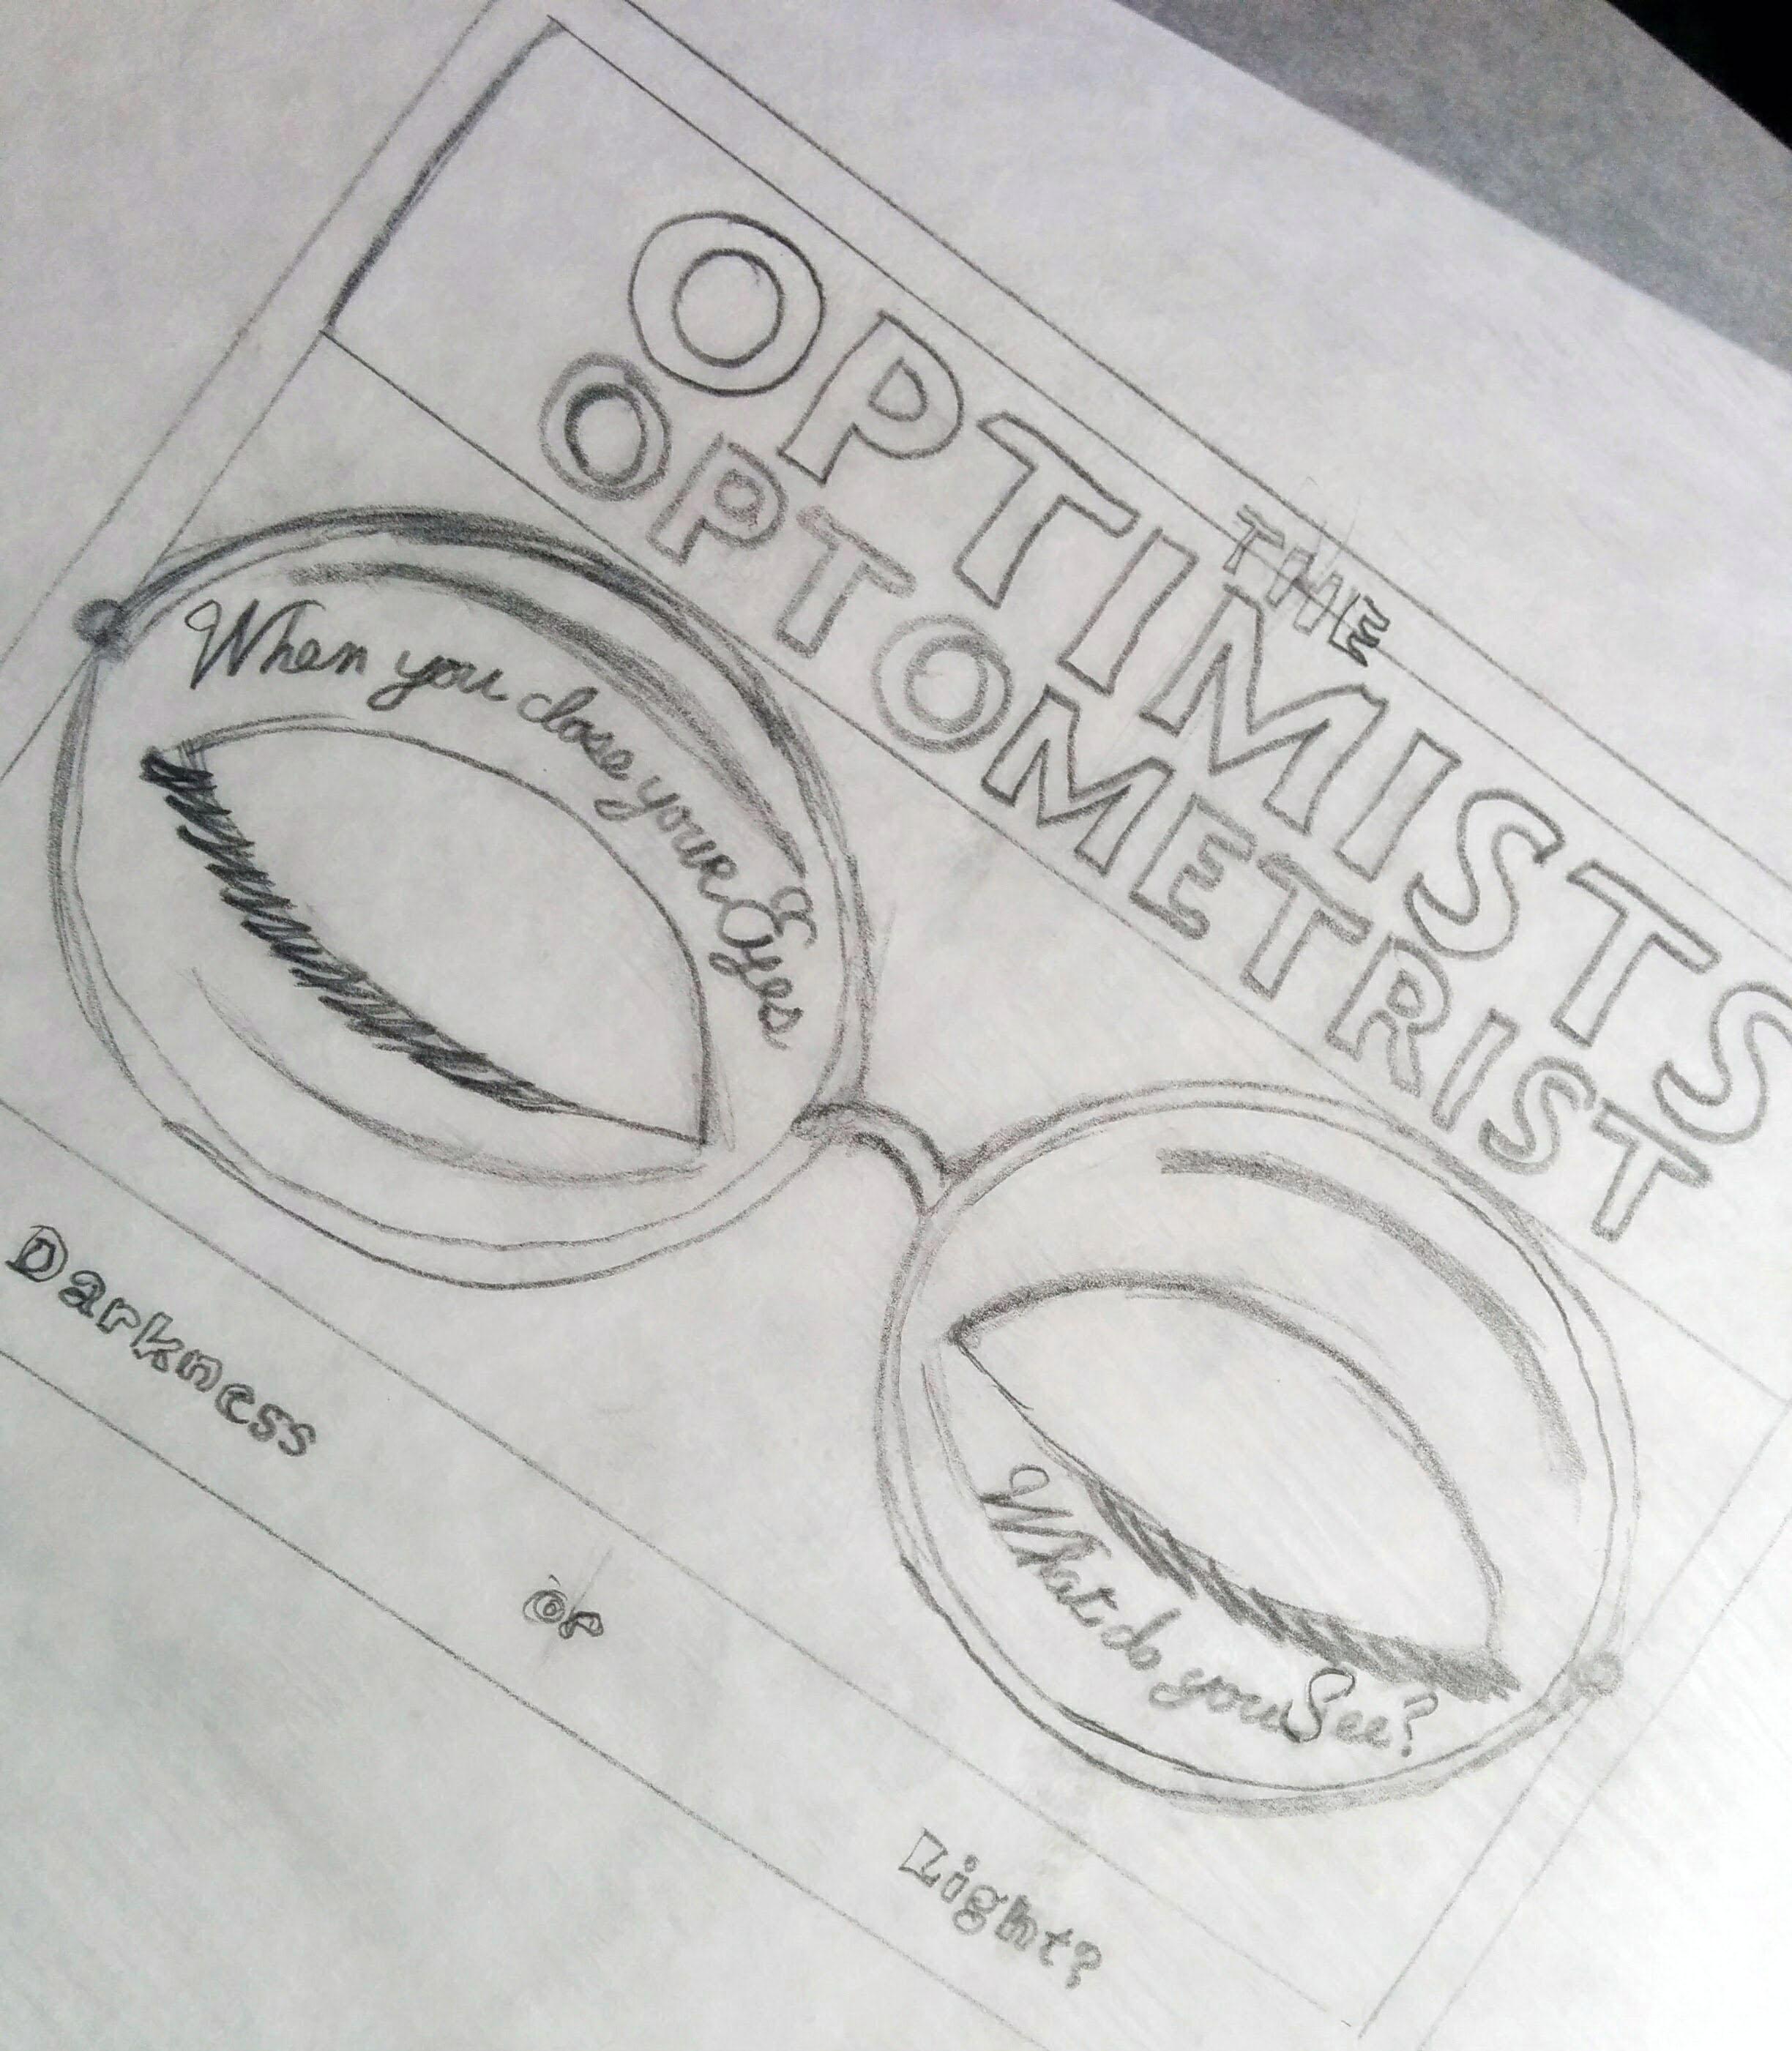 The optimists optometrist Sketch.jpg